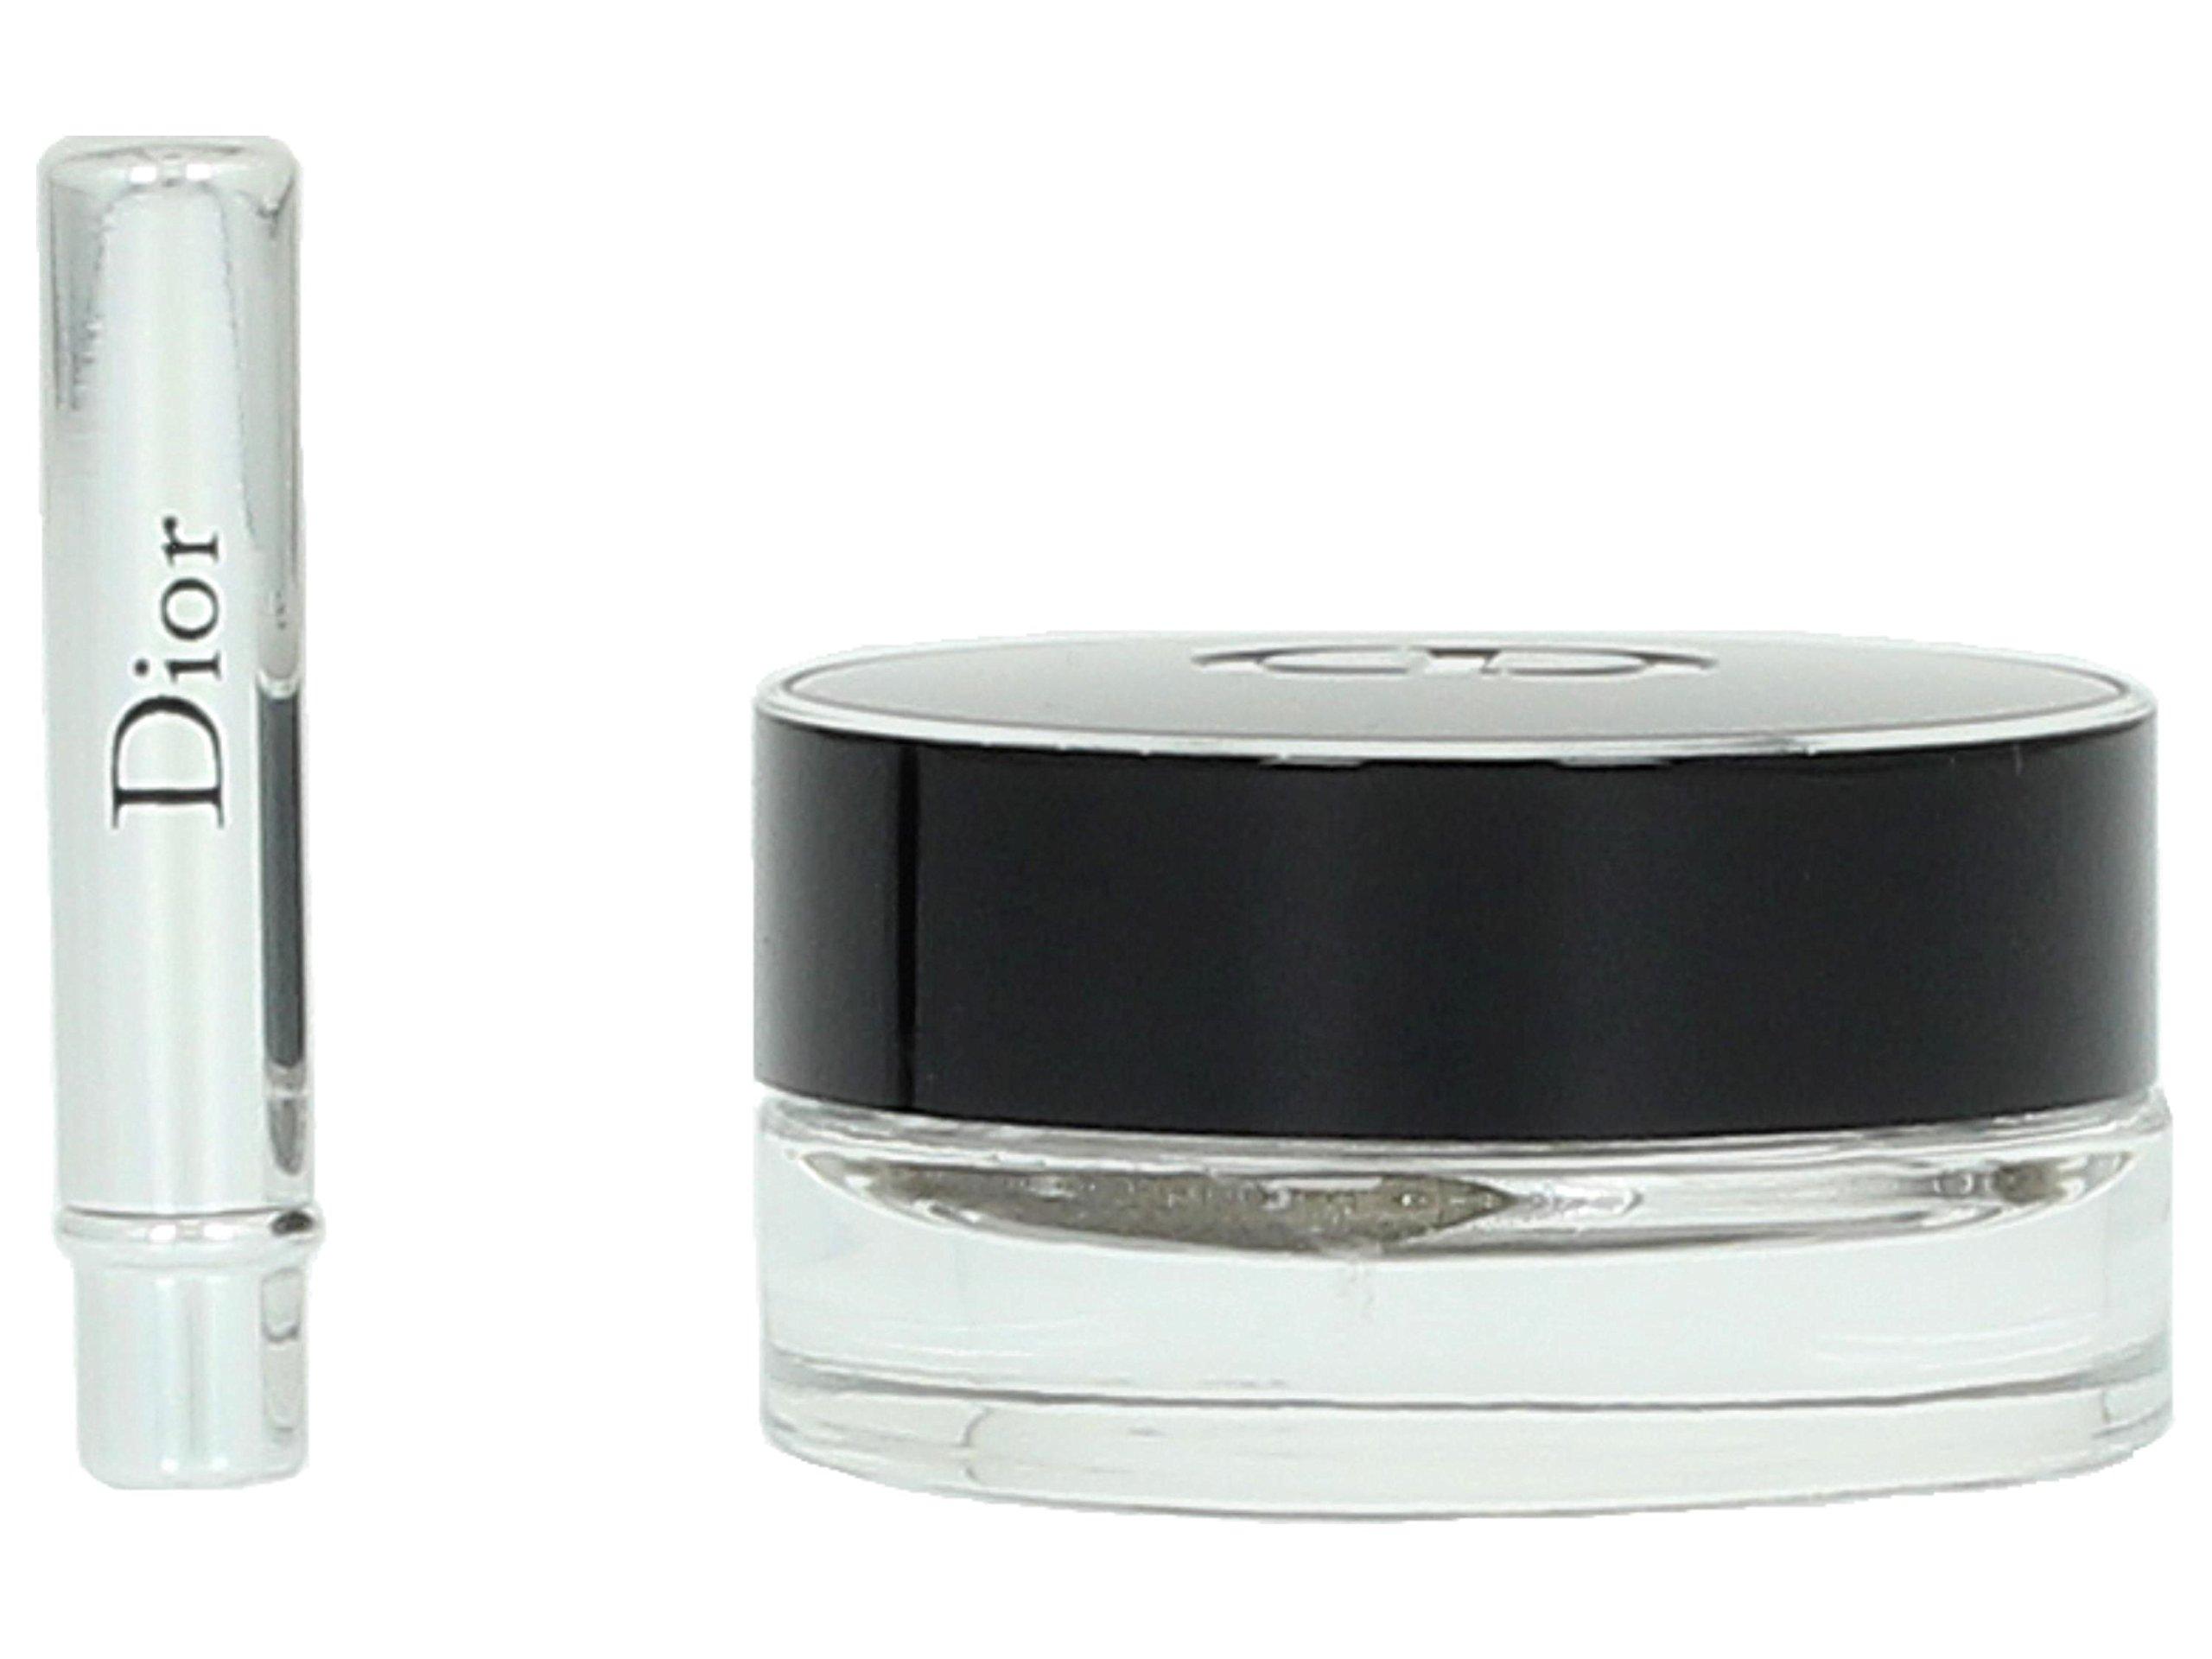 Christian Dior Show Fusion Mono Millennium Eyeshadow for Women, 0.22 Ounce